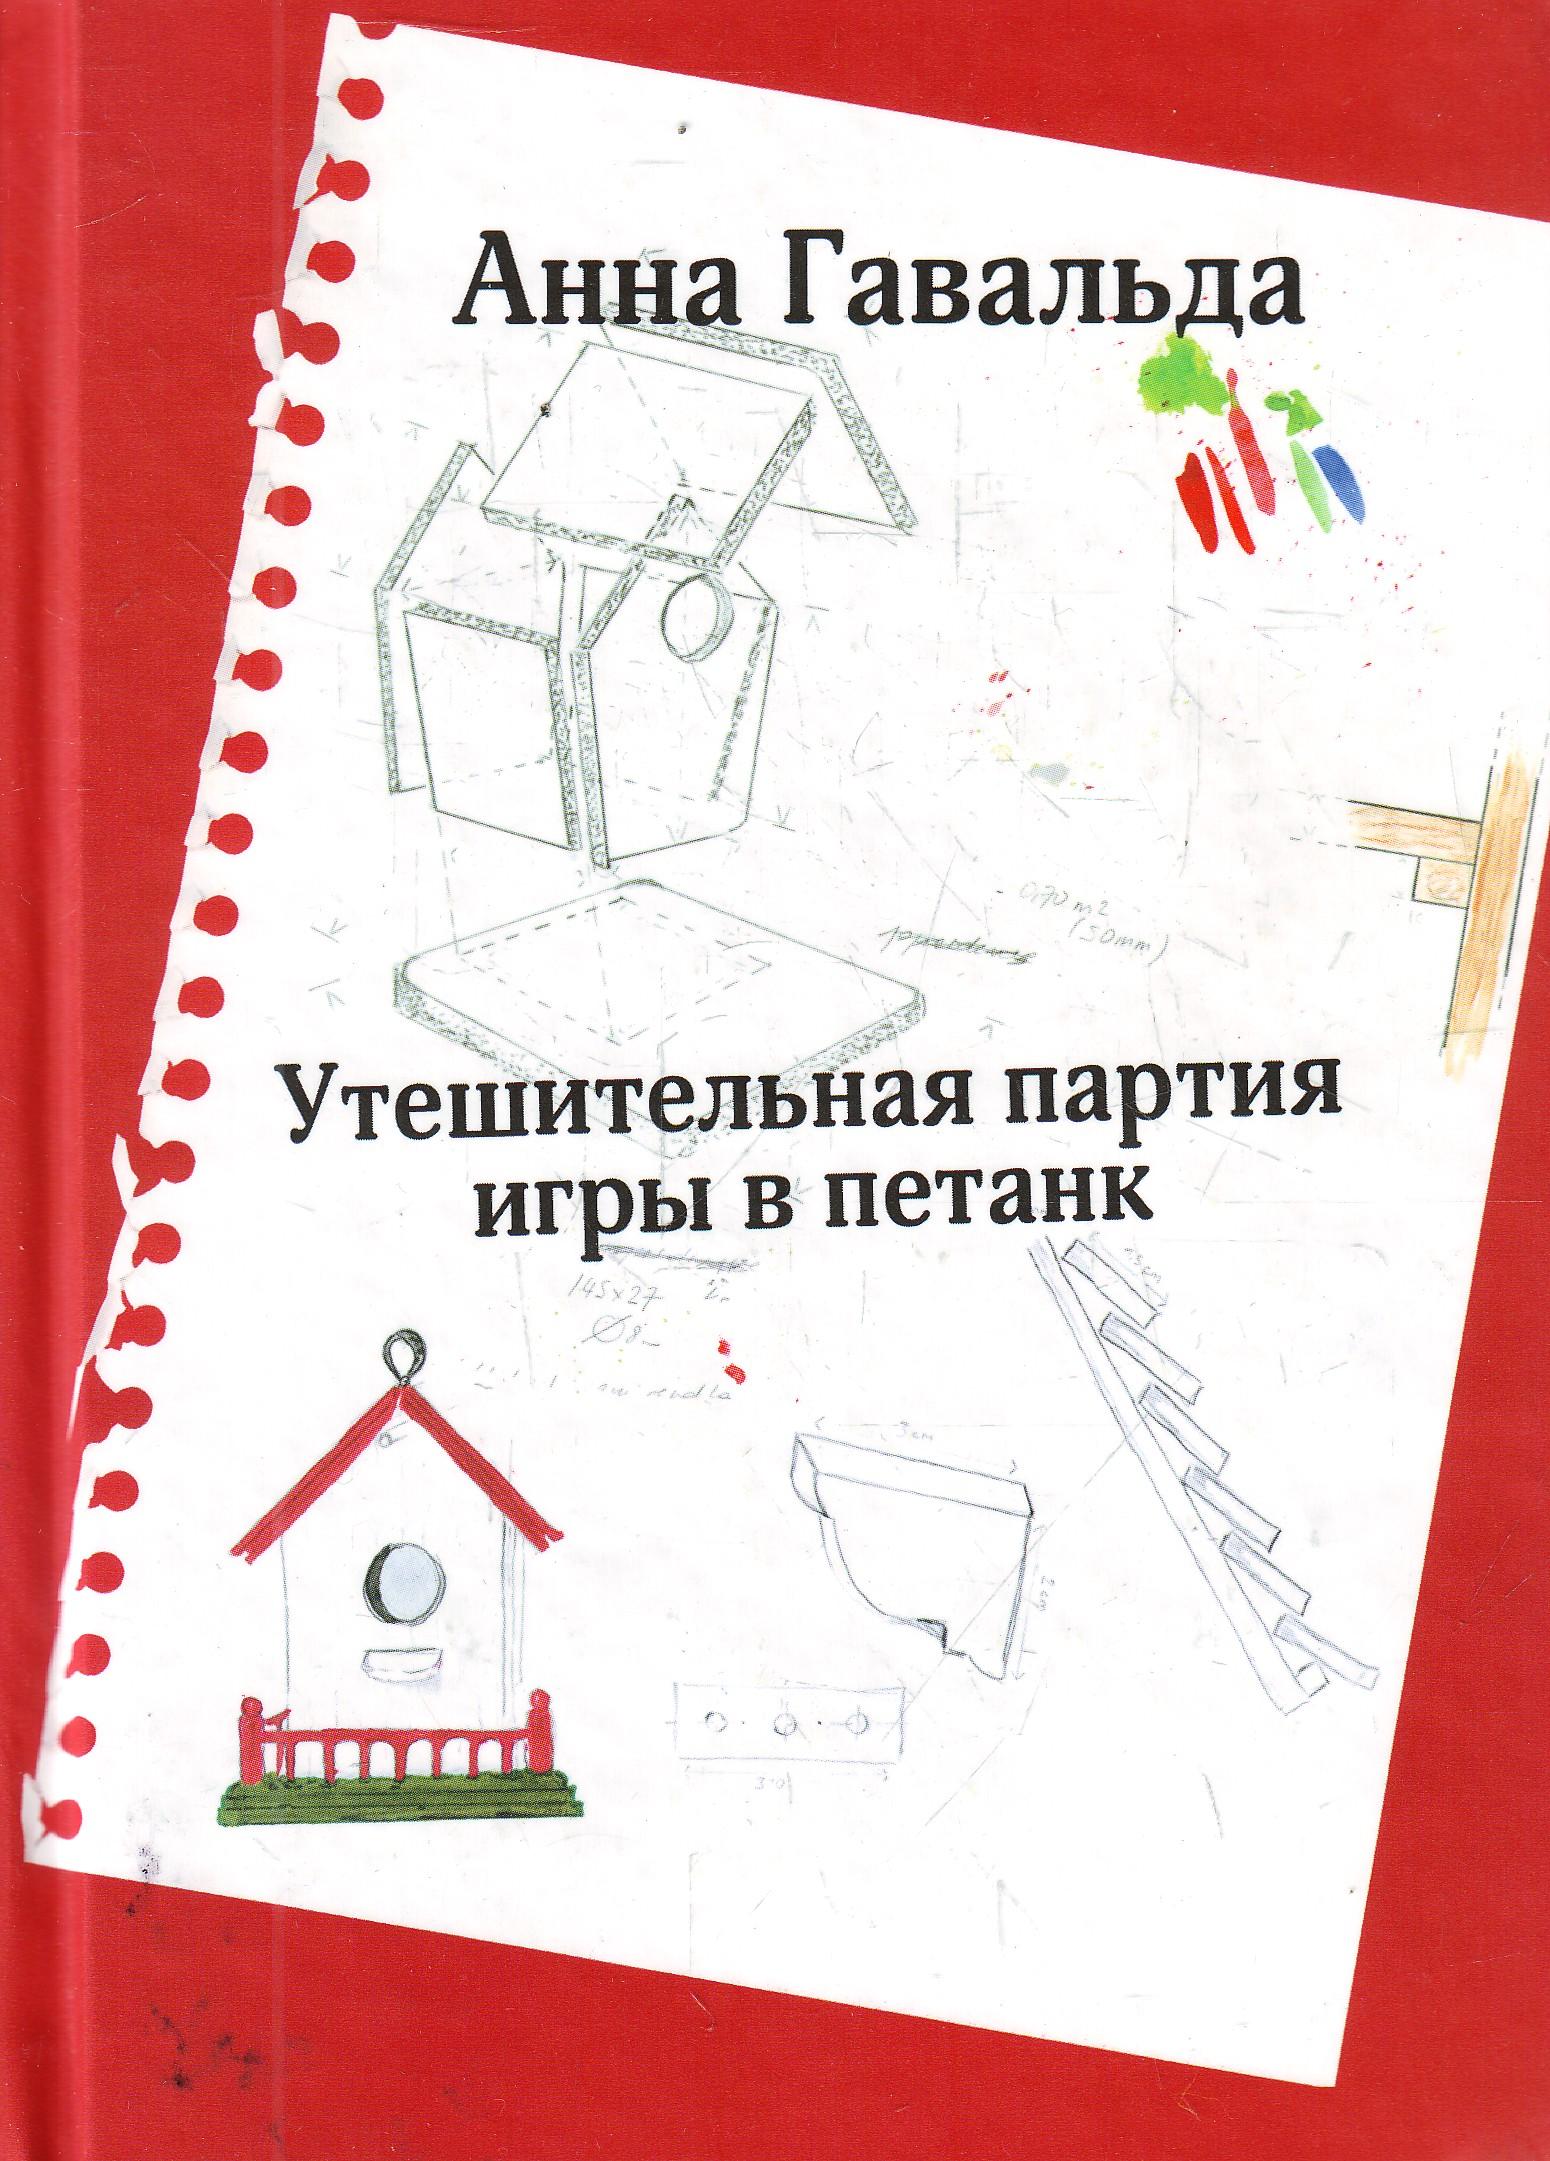 http://www.ruslania.com/pictures/big/9785170623372.jpg